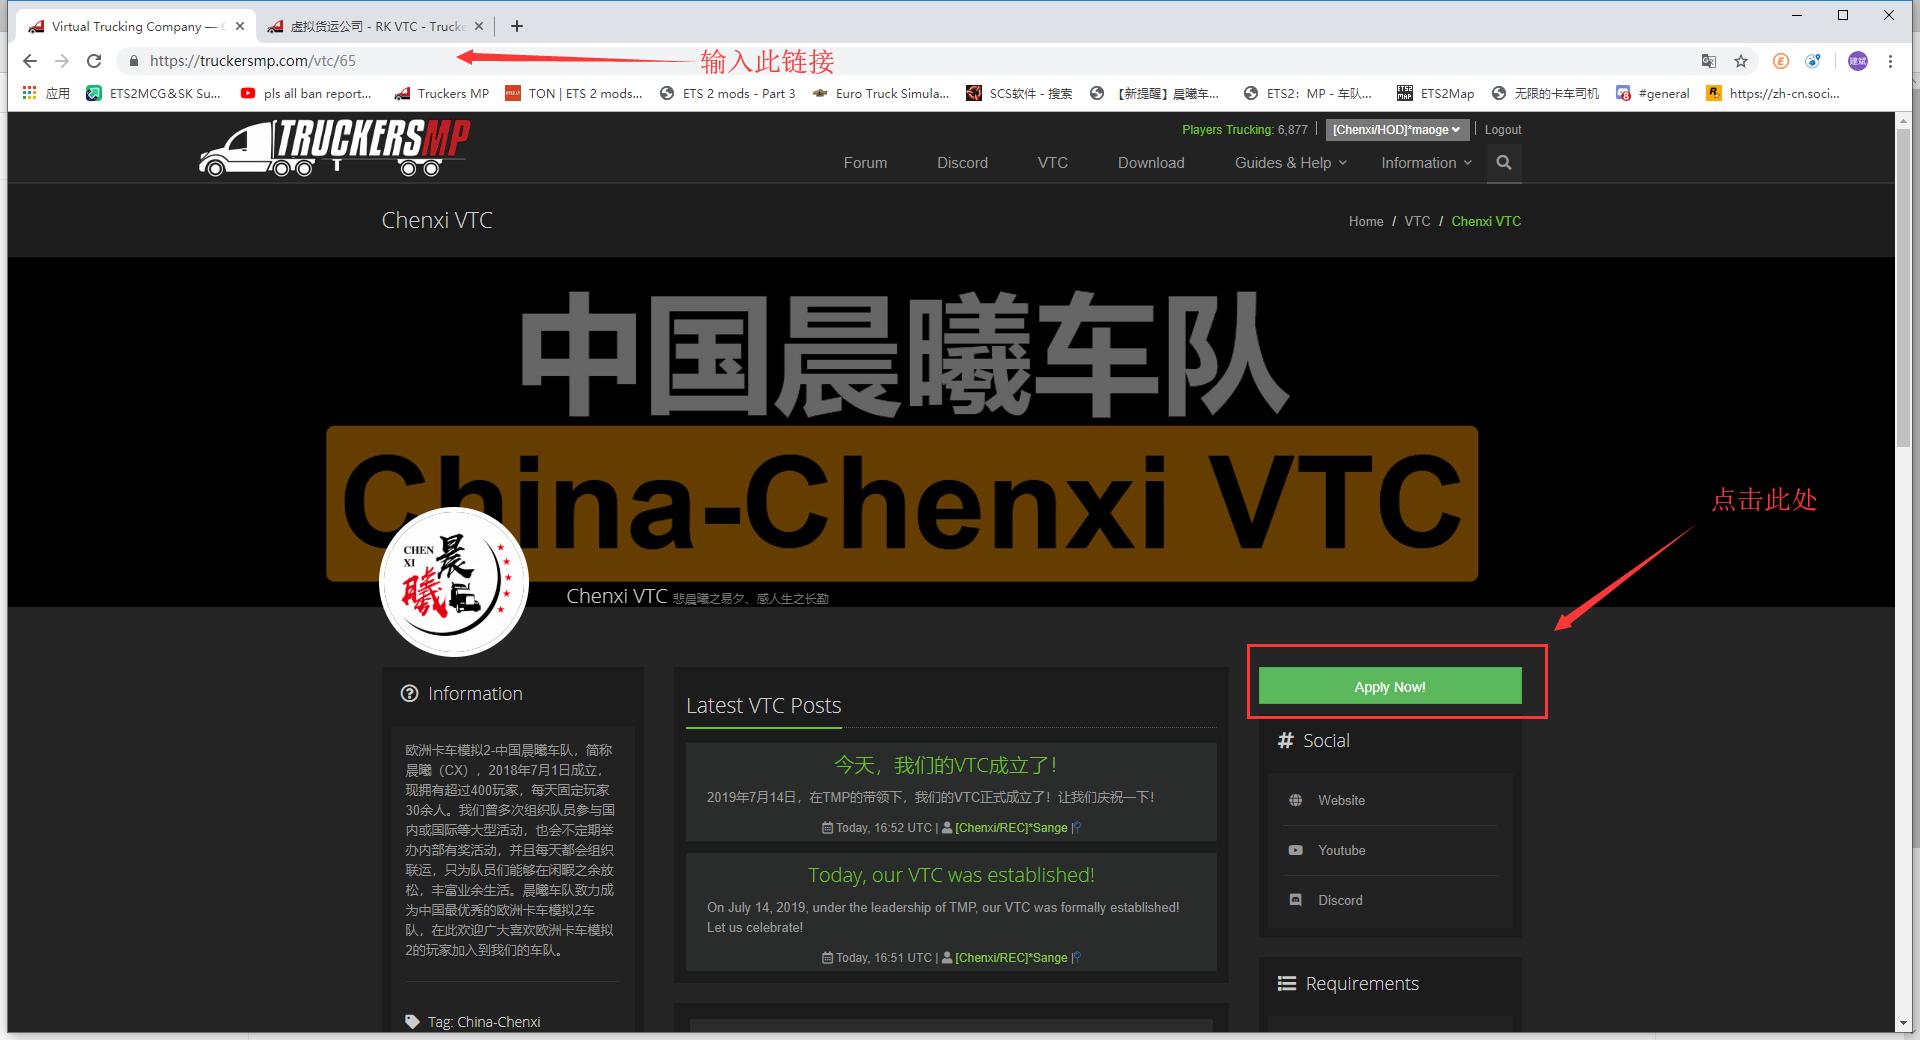 -CVV1_-422TO2OC-RWX---1